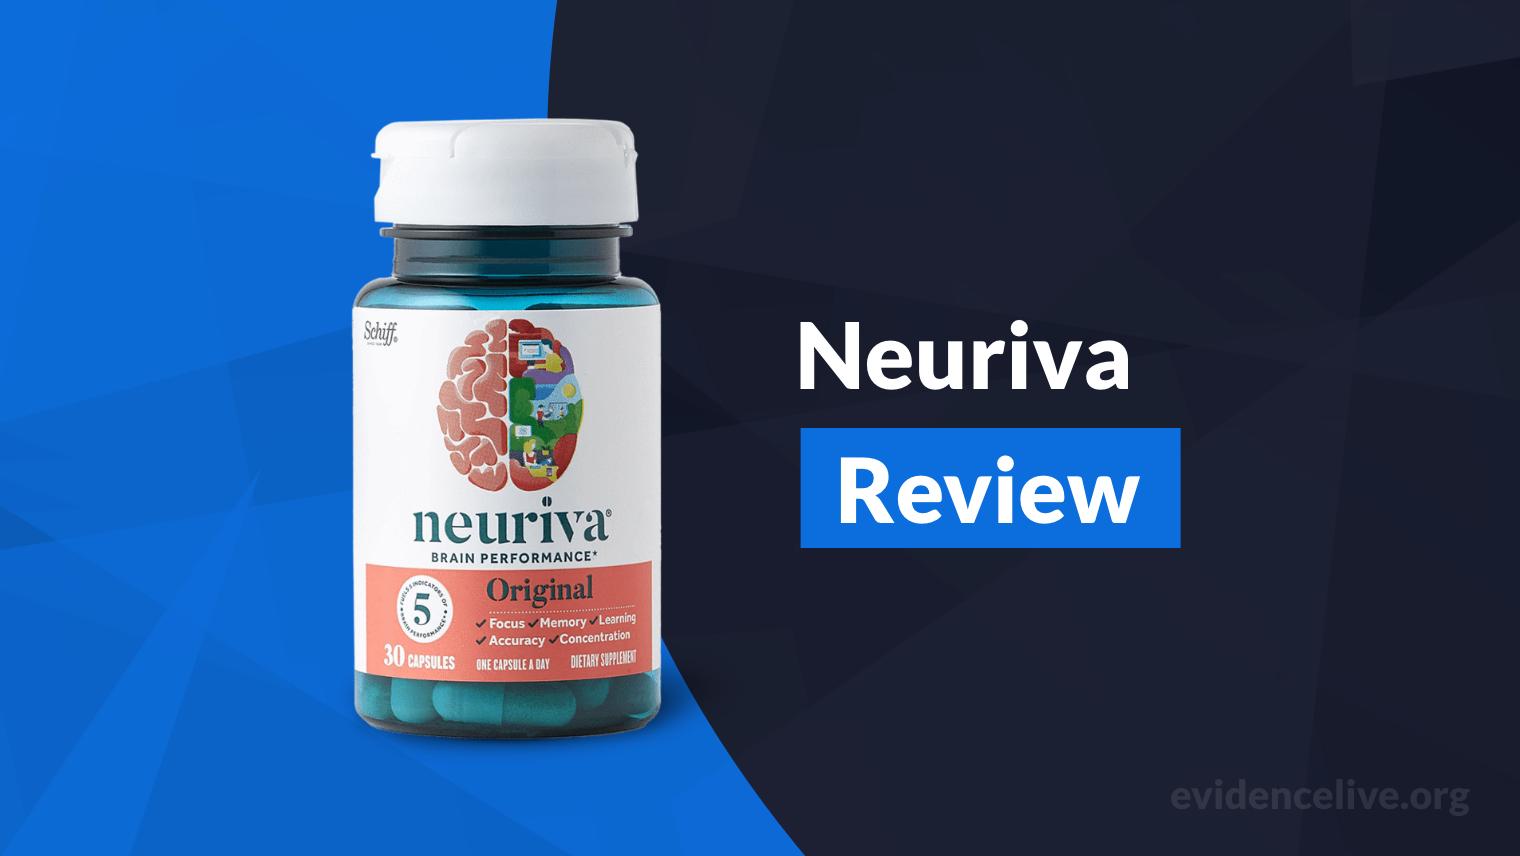 Neuriva Review: Is It An Effective Brain Supplement?